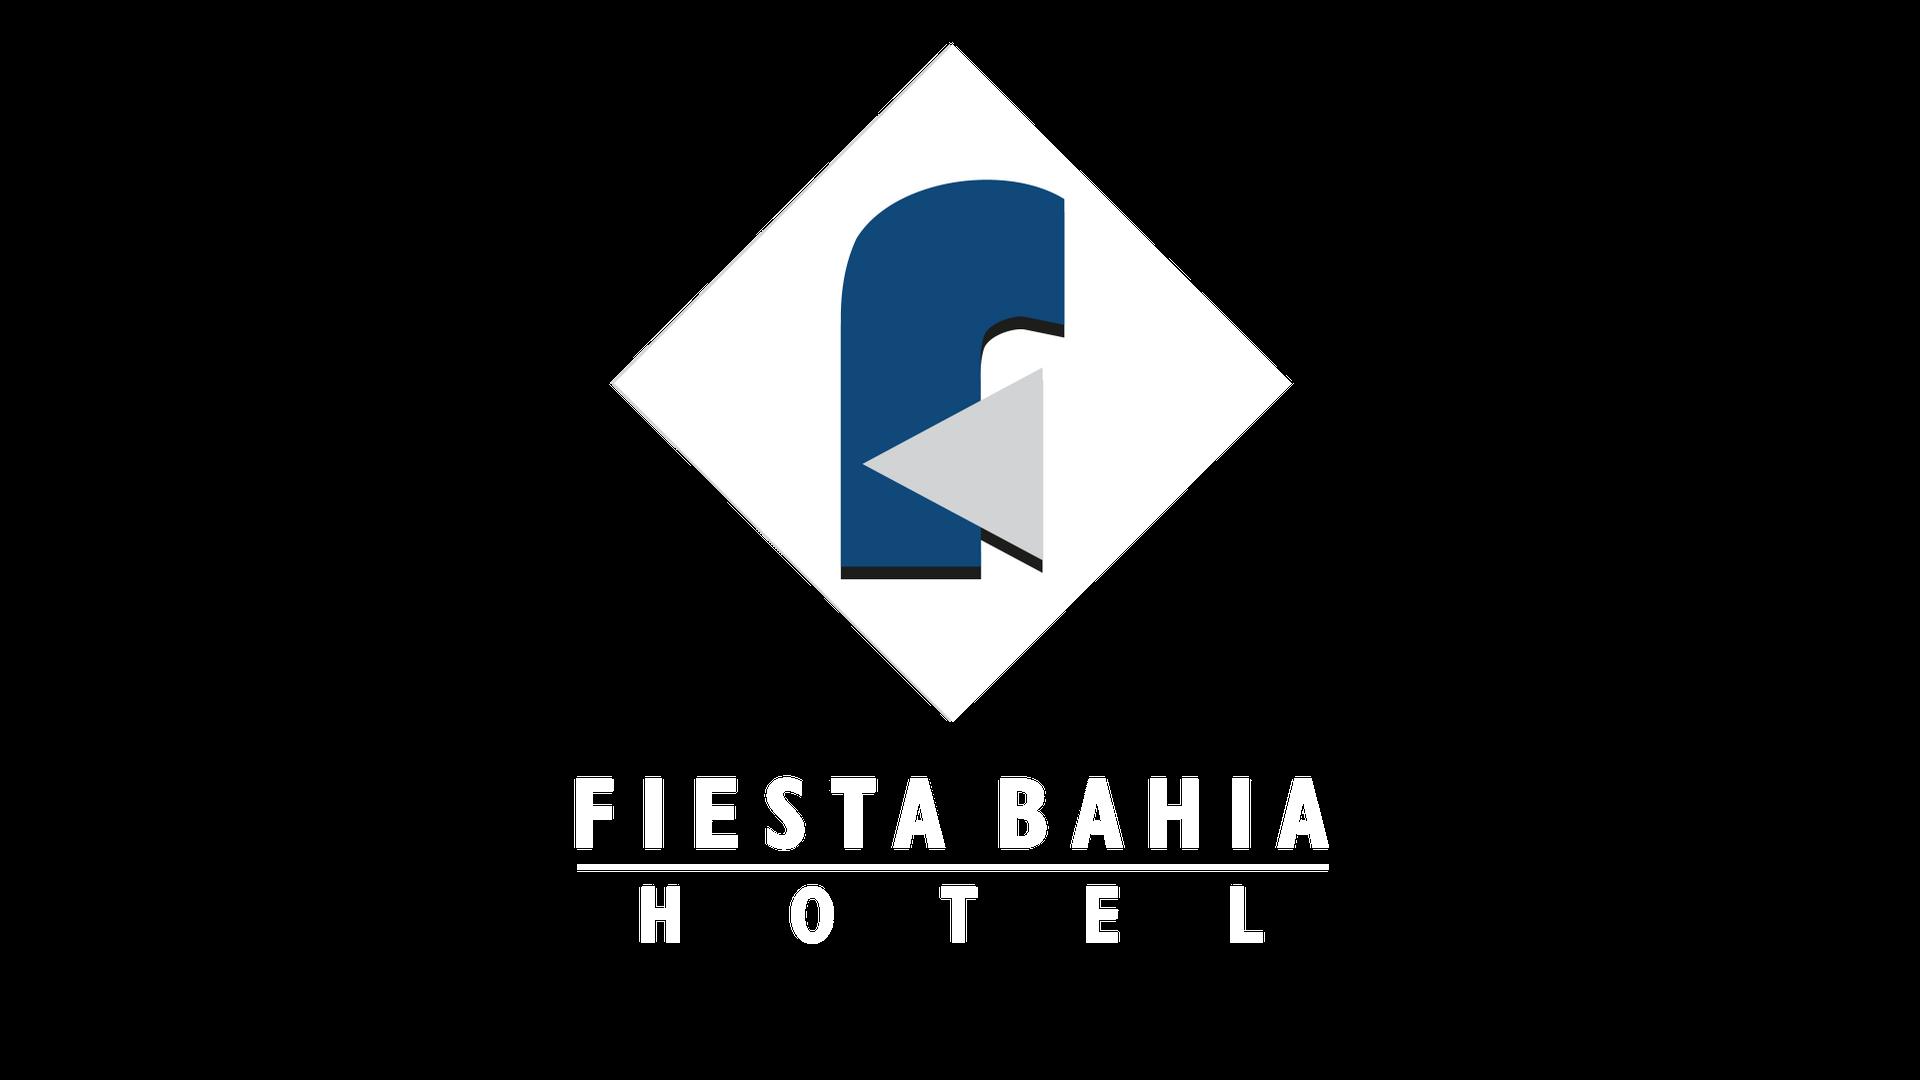 Fiesta Bahia Hotel